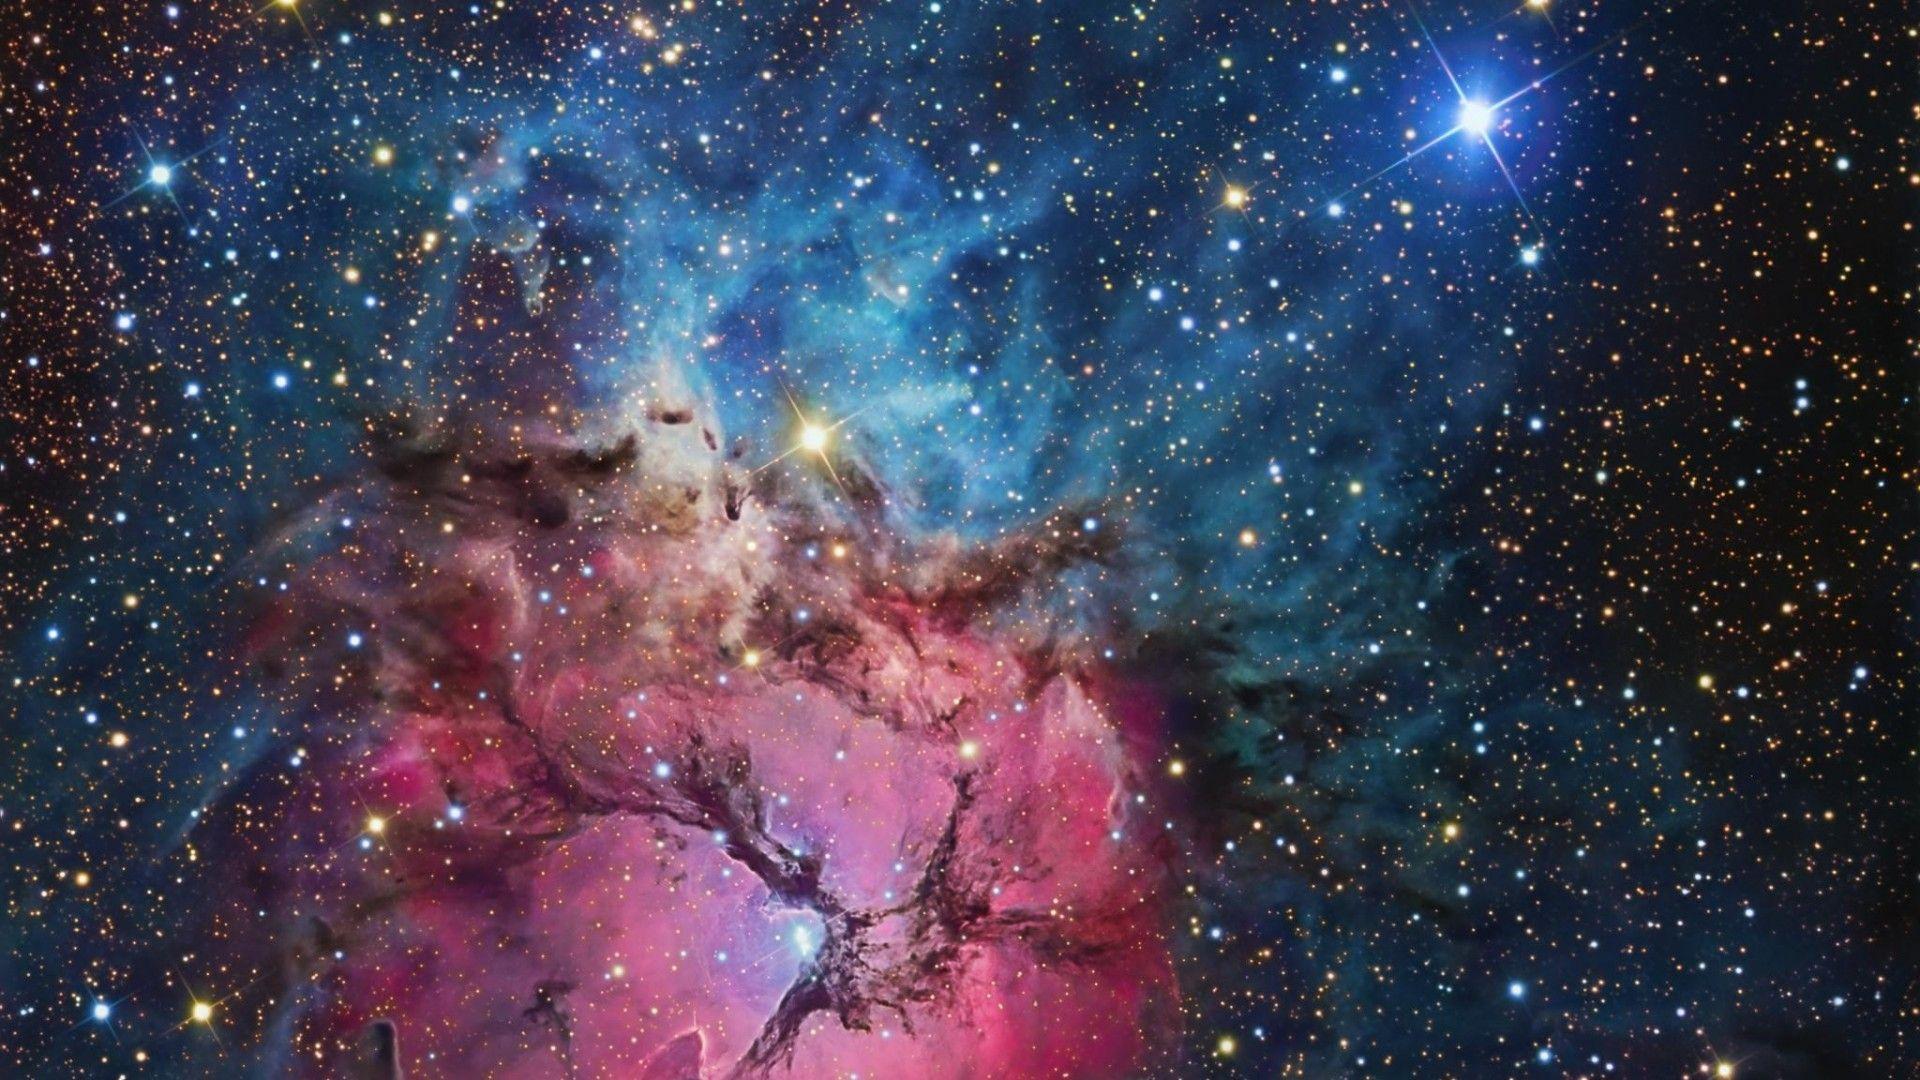 Astronomy Desktop Wallpapers Top Free Astronomy Desktop Backgrounds Wallpaperaccess